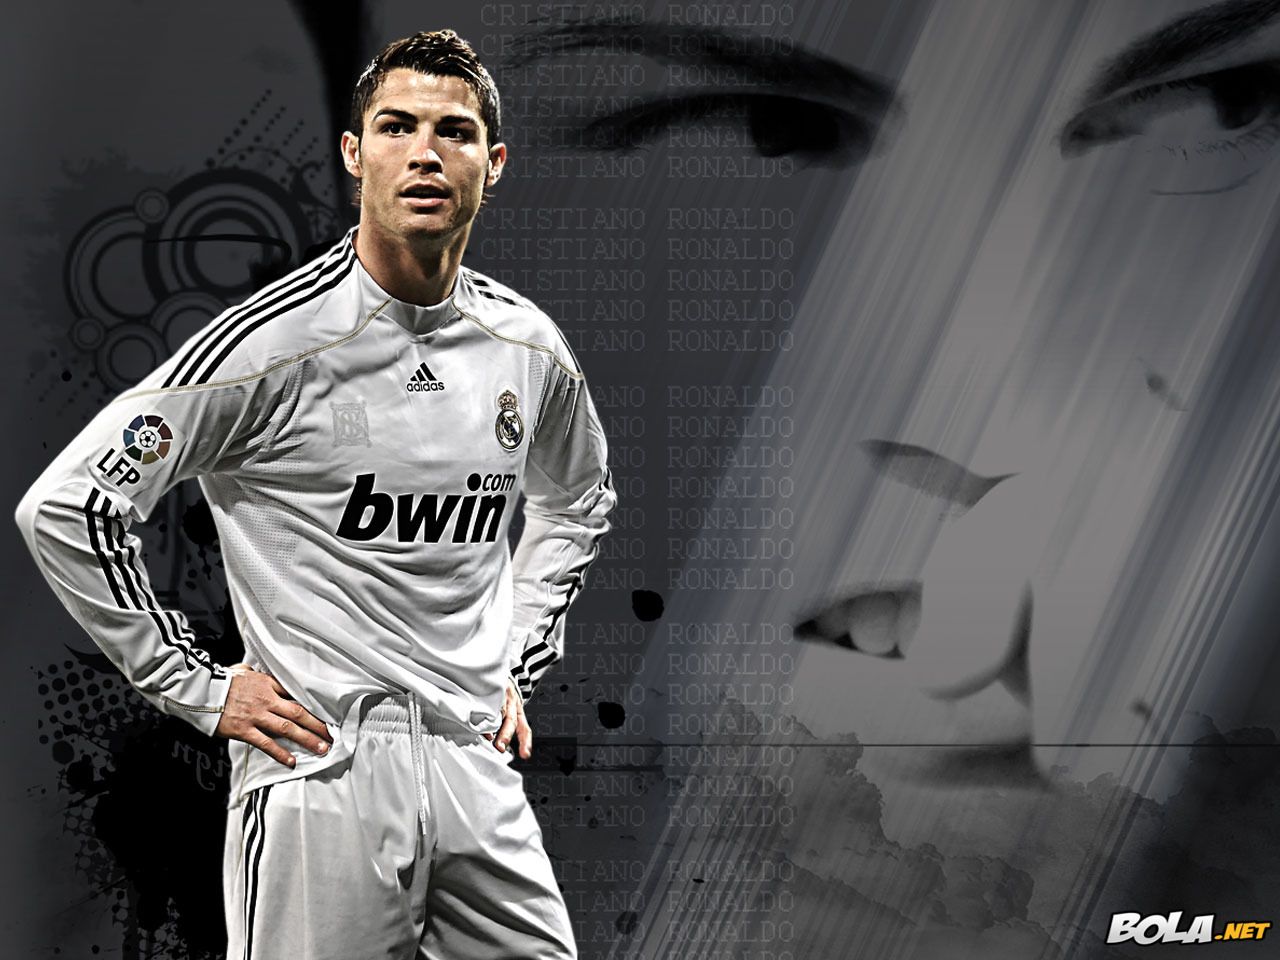 SD-Cristiano-Ronaldo-4-2.jpg